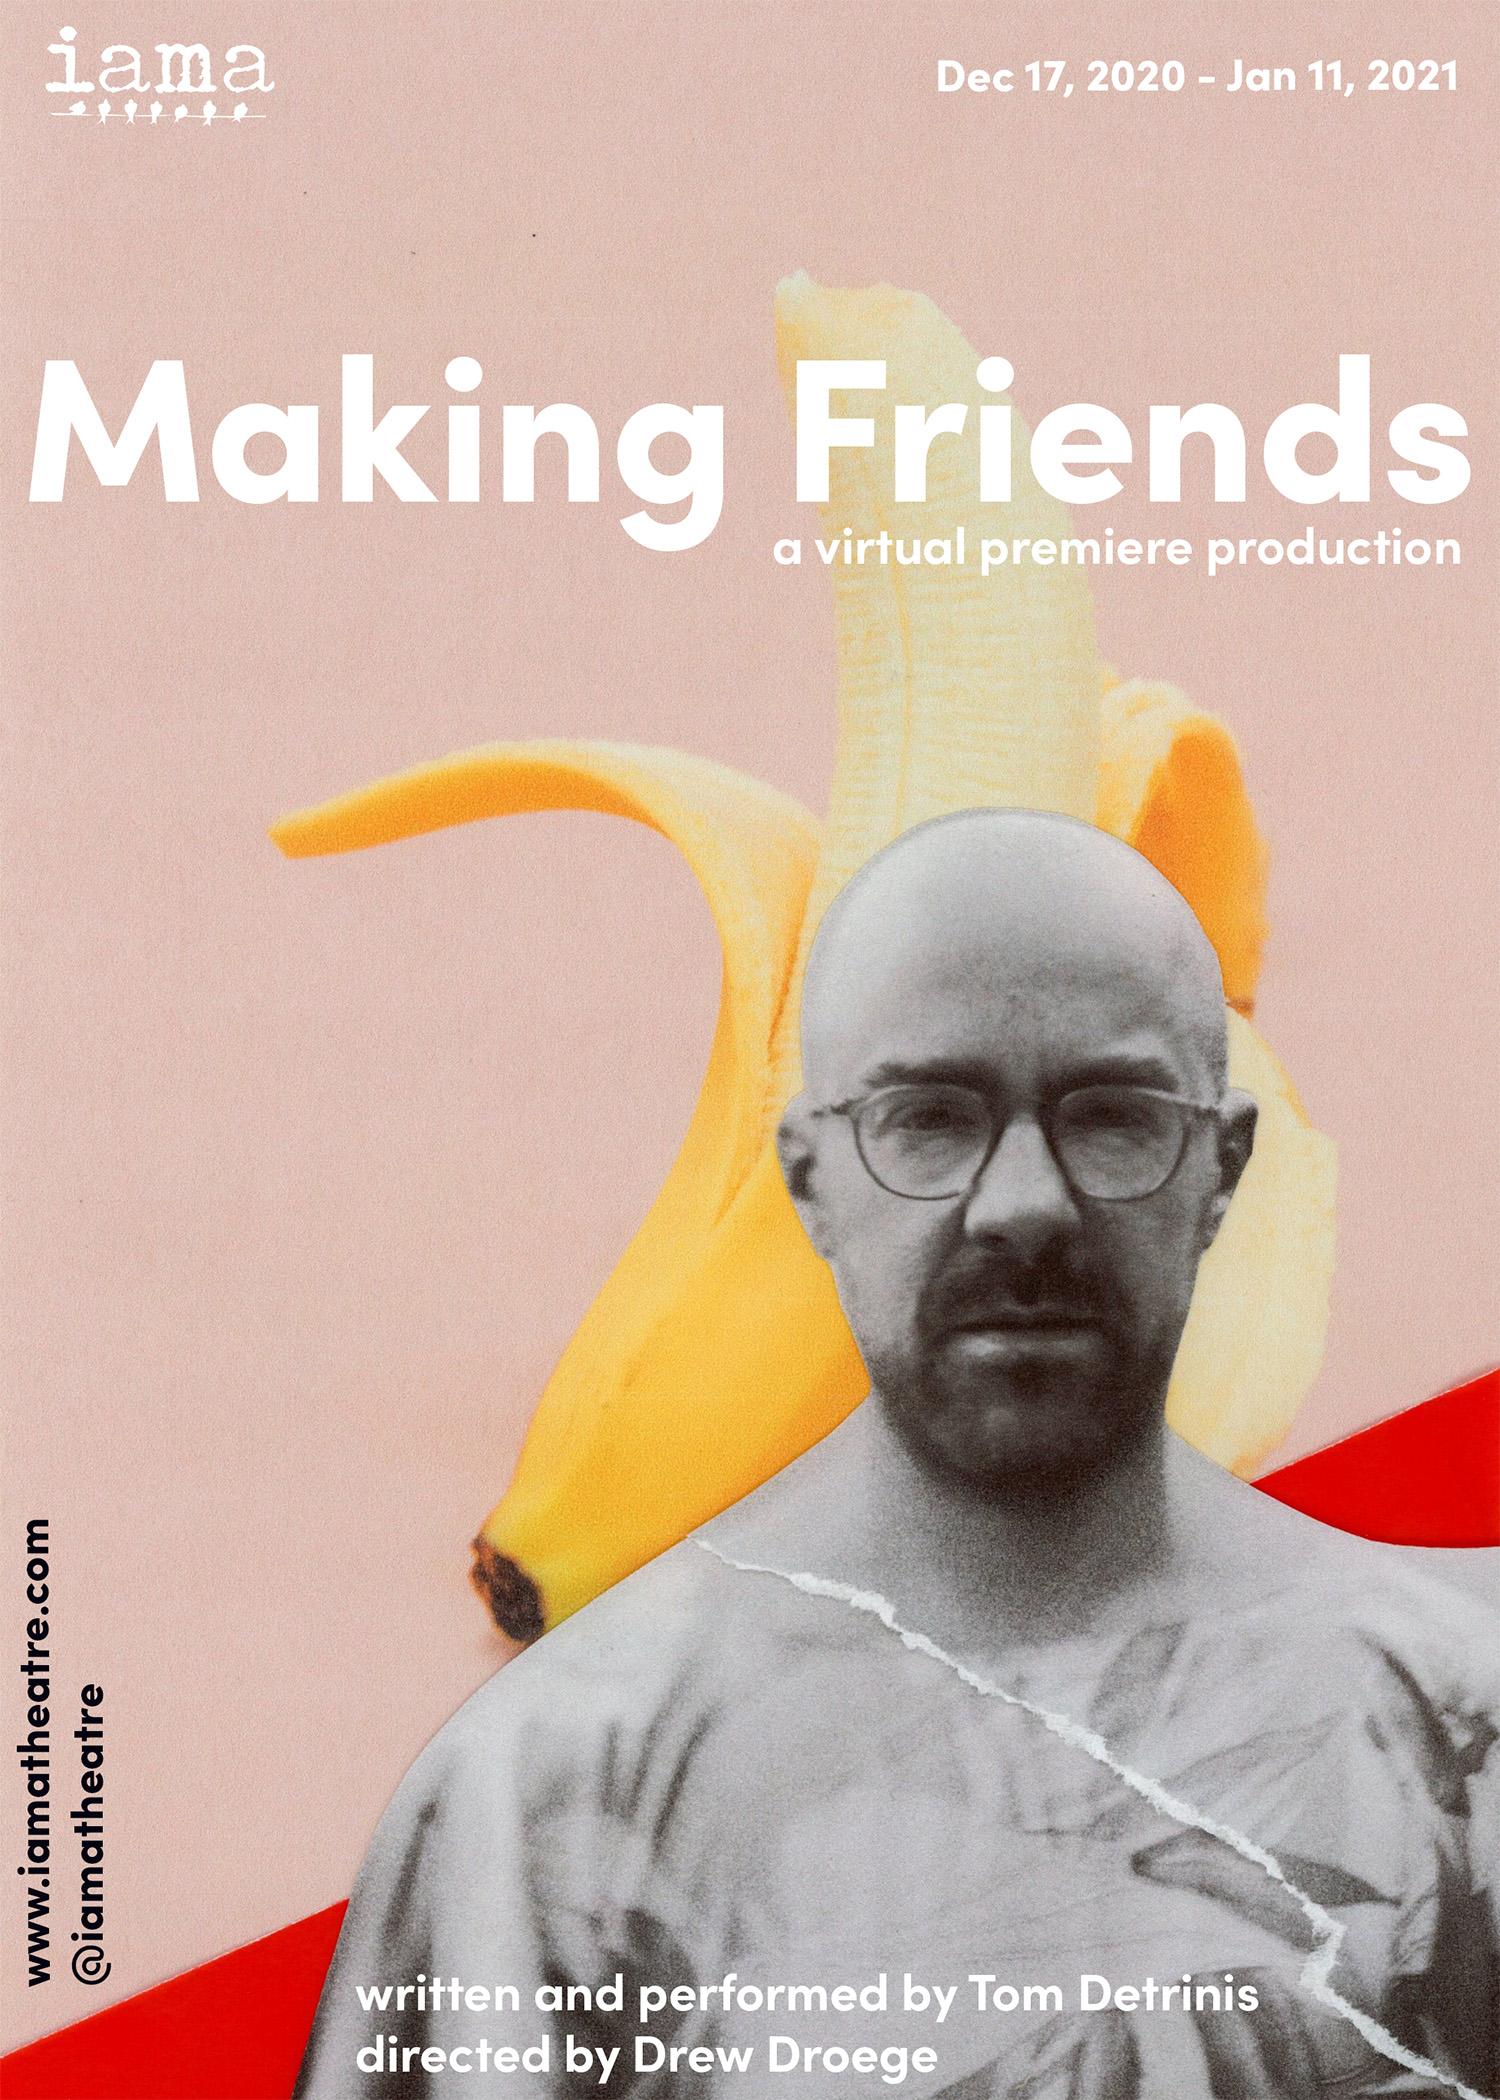 IAMA Streams MAKING FRIENDS by Tom Detrinis